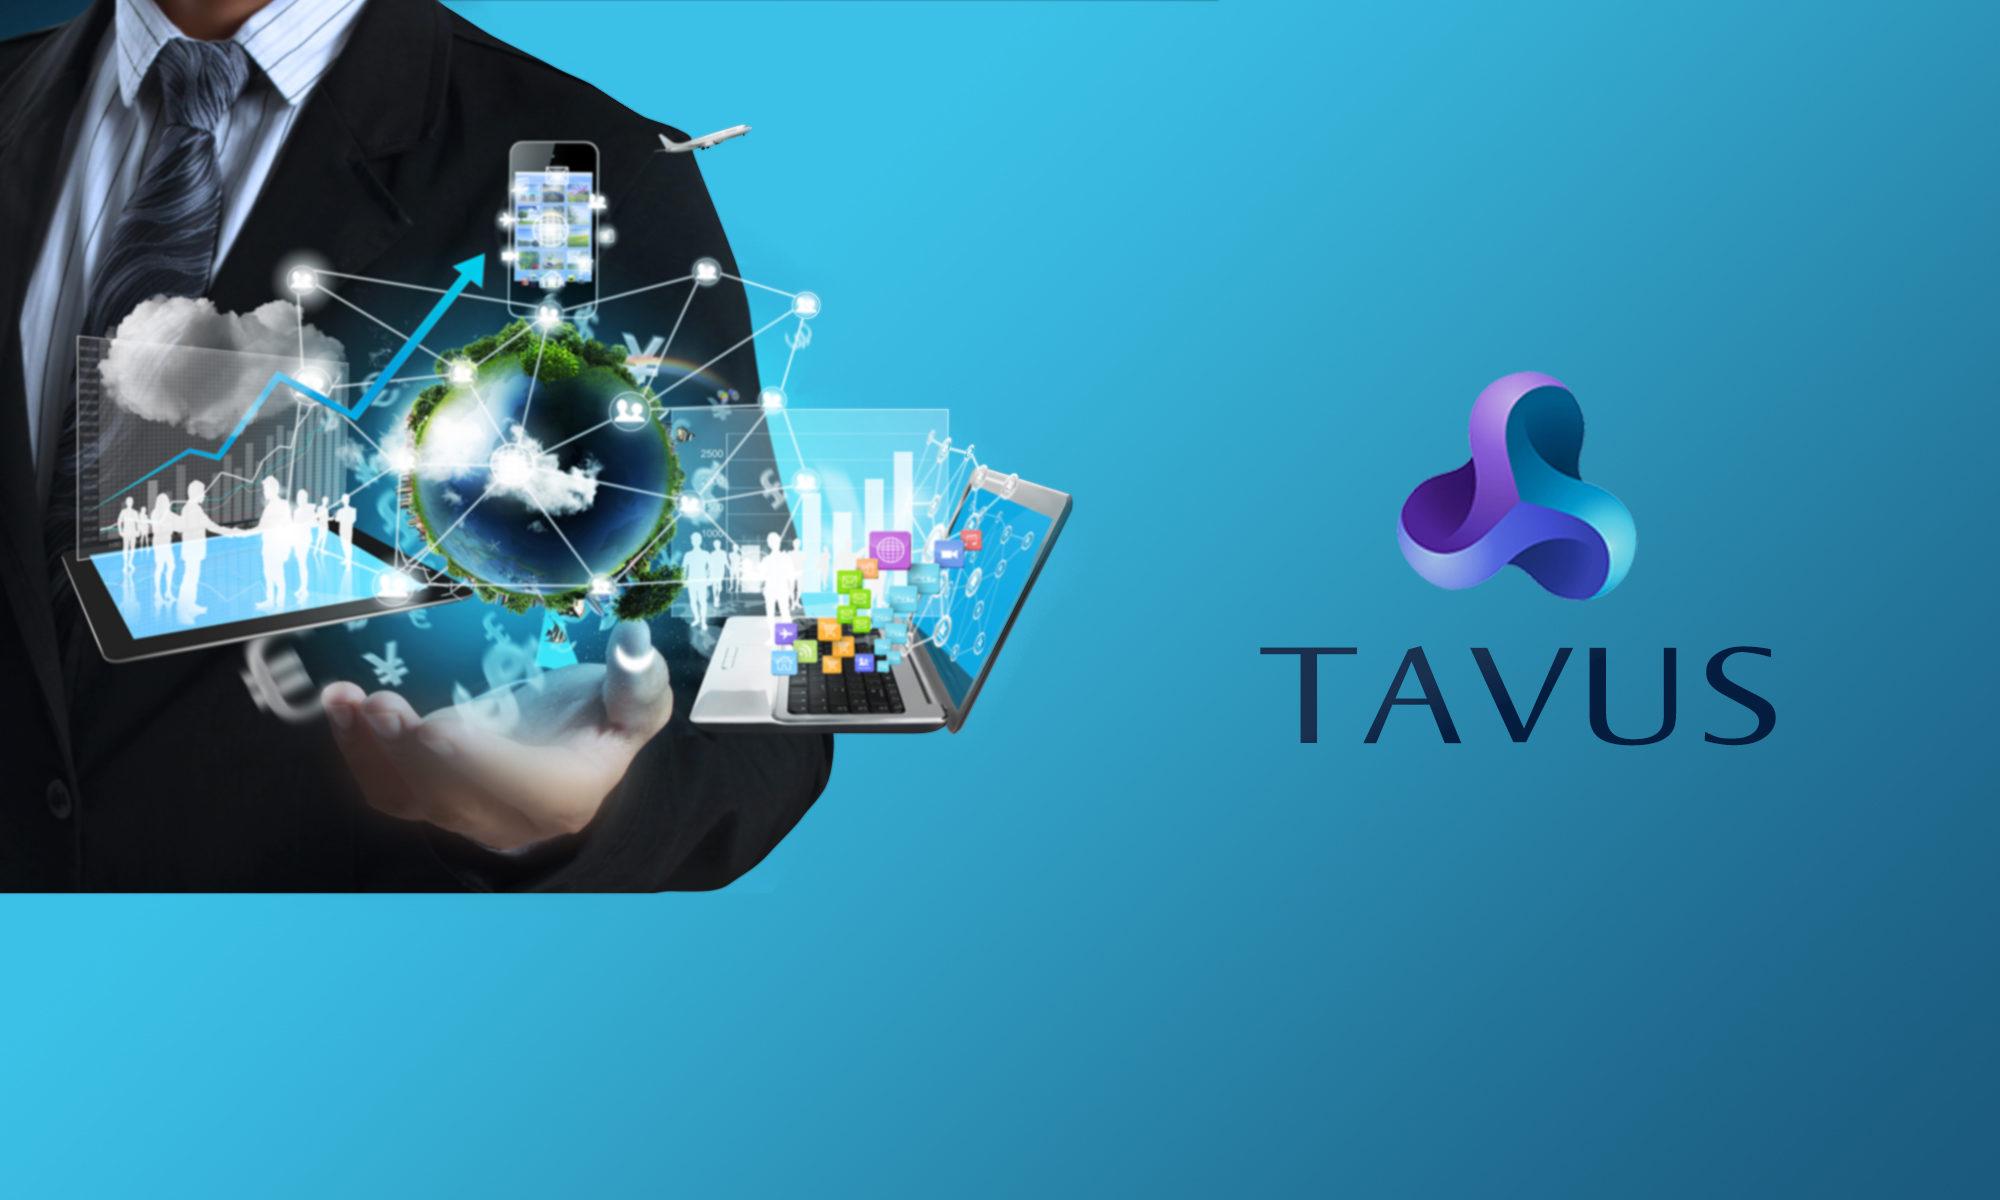 TAVUS OY